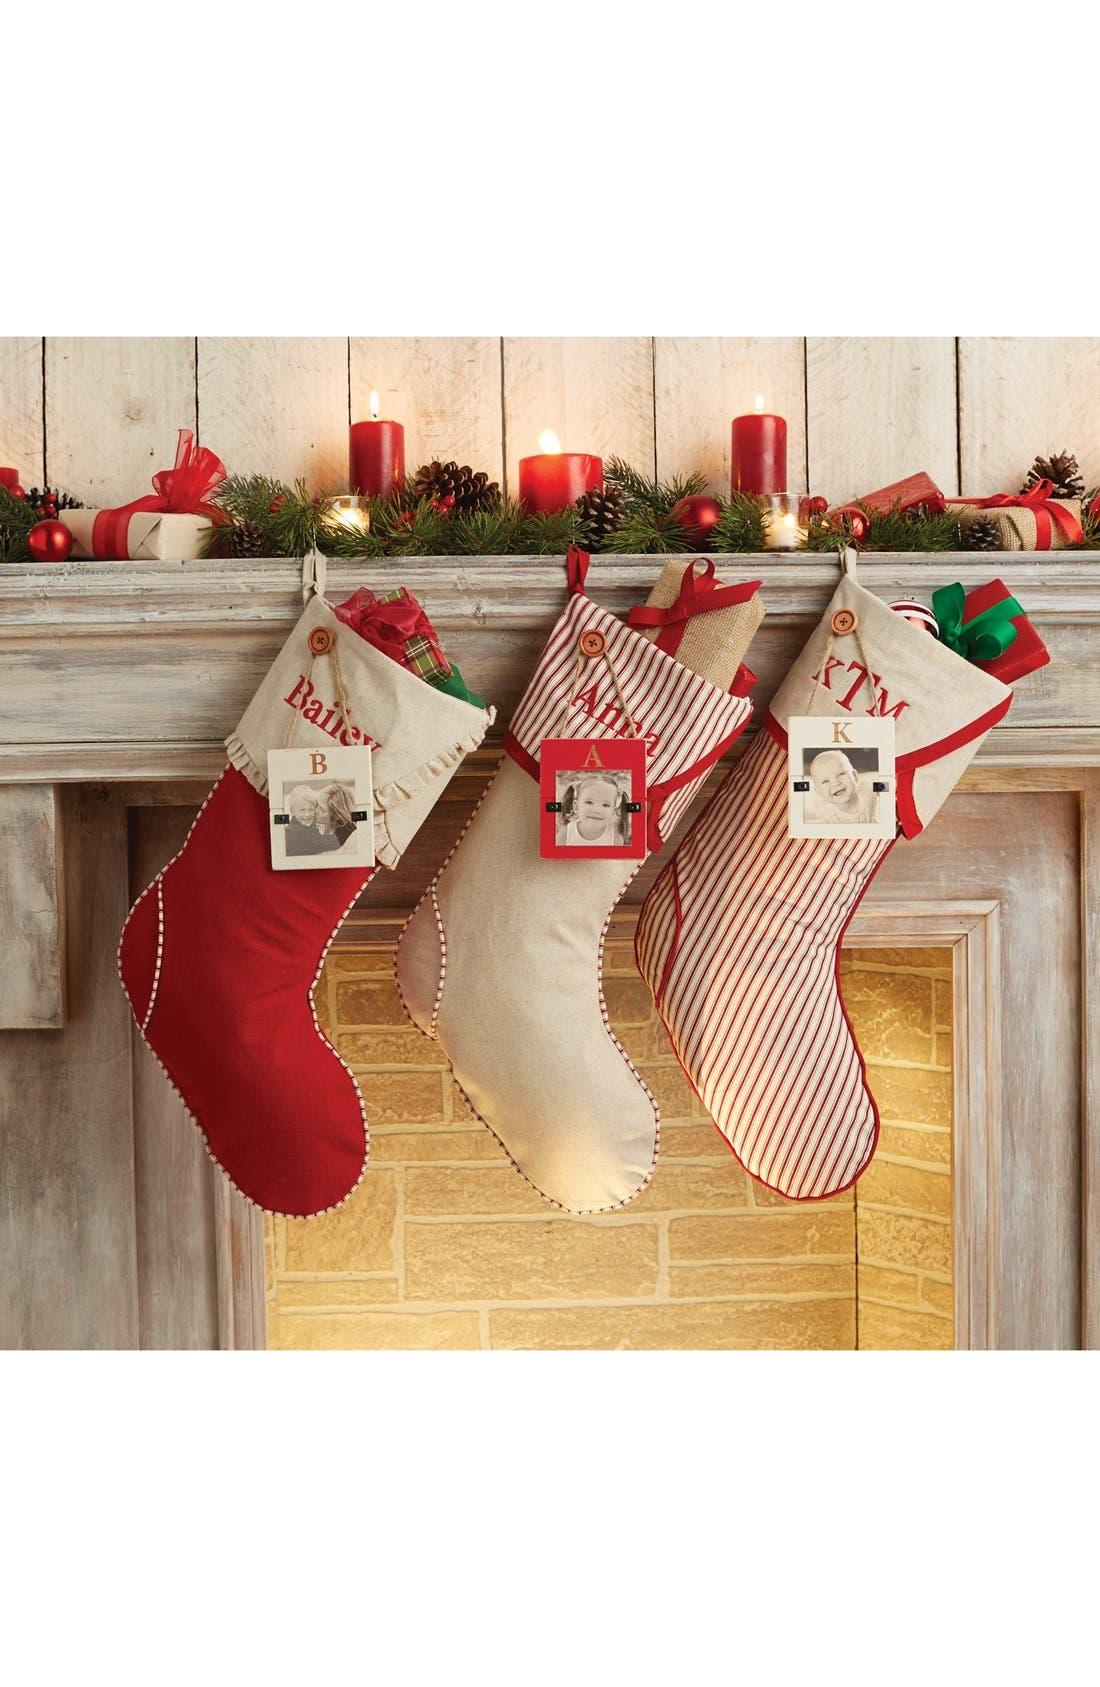 Linen Christmas Stocking & Initial Frame Ornament,                             Alternate thumbnail 2, color,                             600